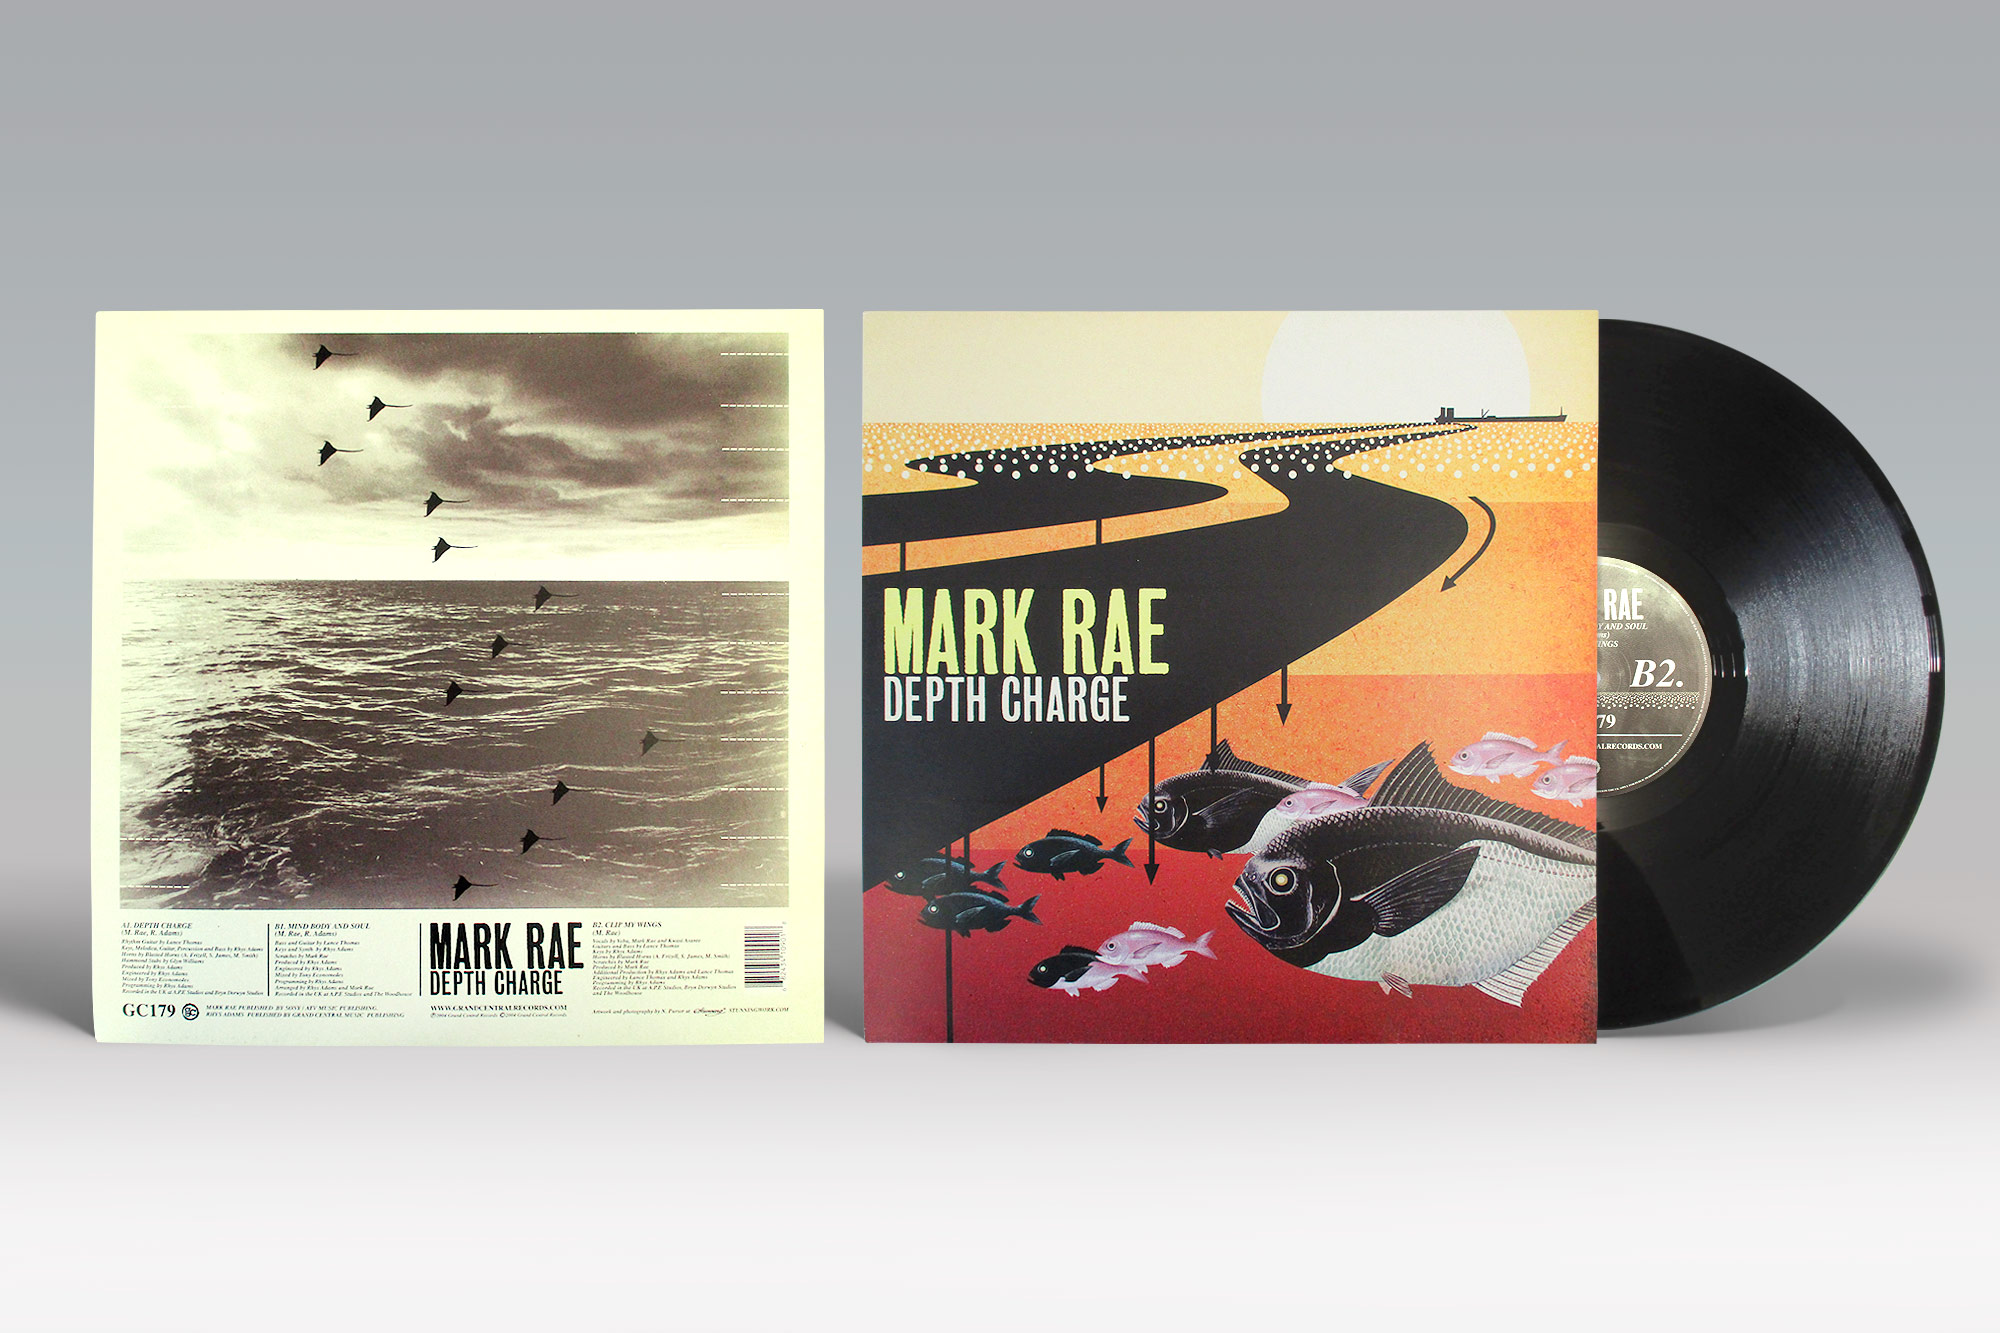 nick-purser-grand-central-records-into-the-depths-e